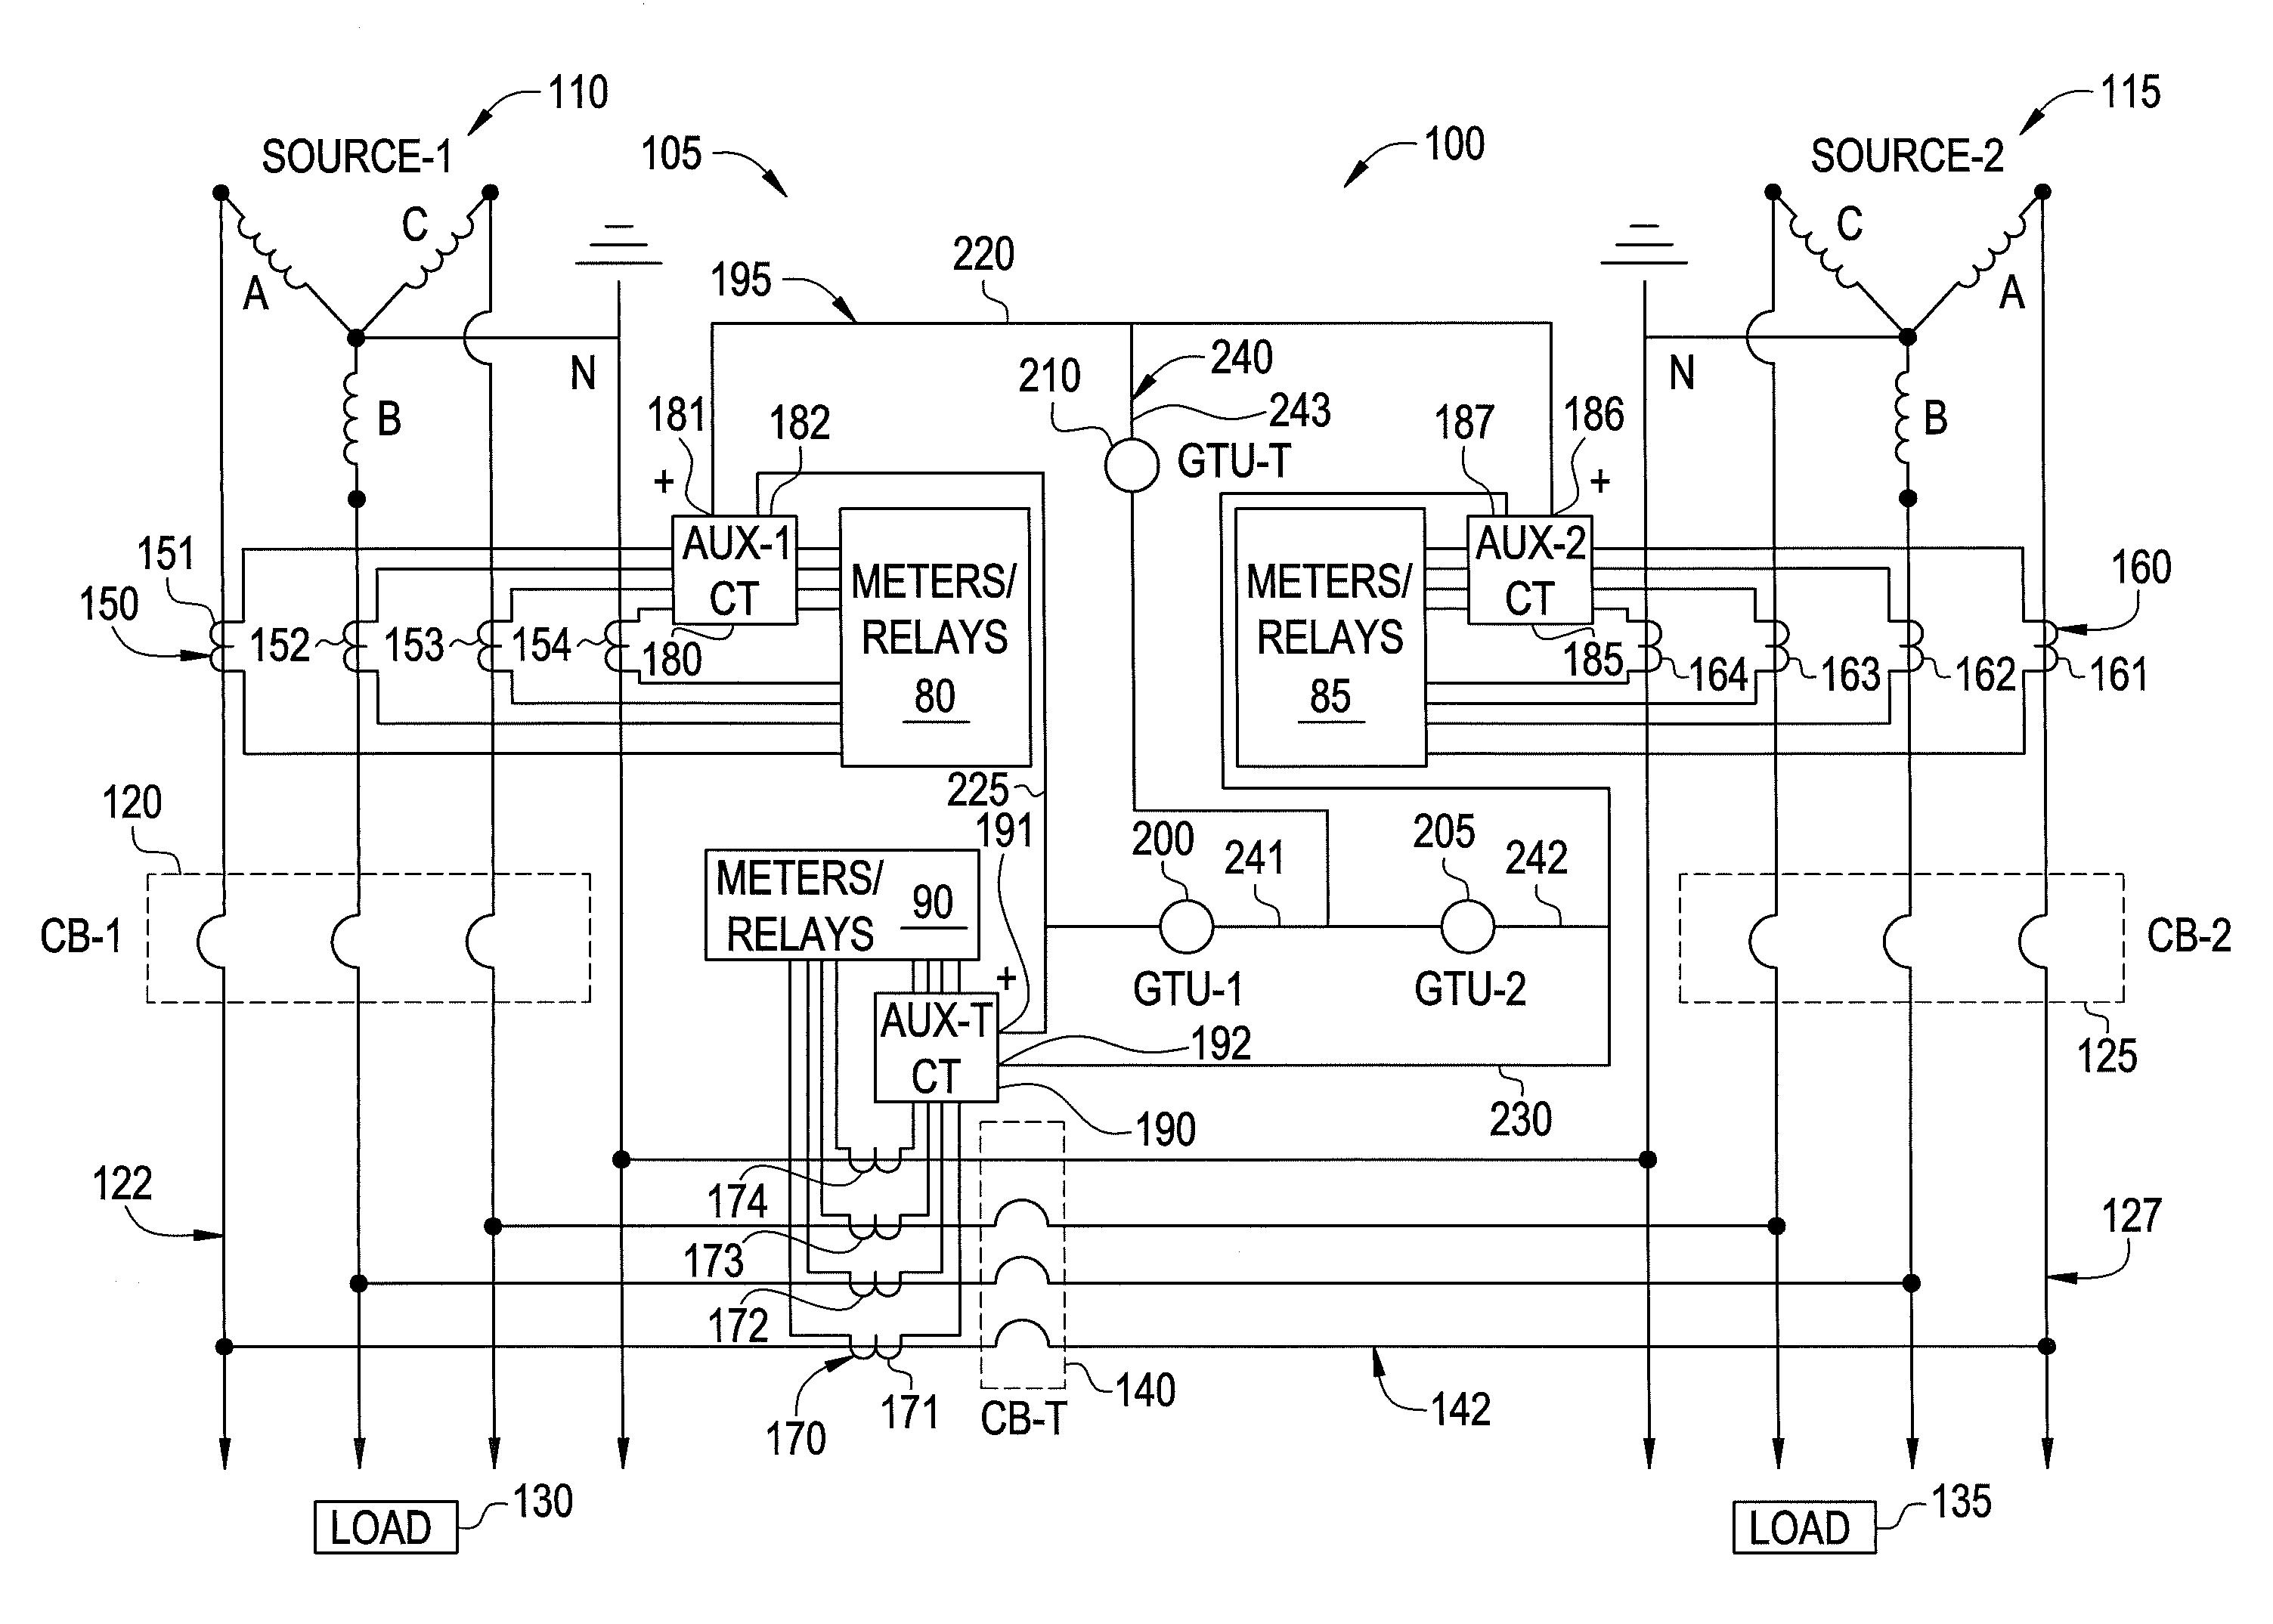 Ground Fault Circuit Interrupter Wiring Diagram